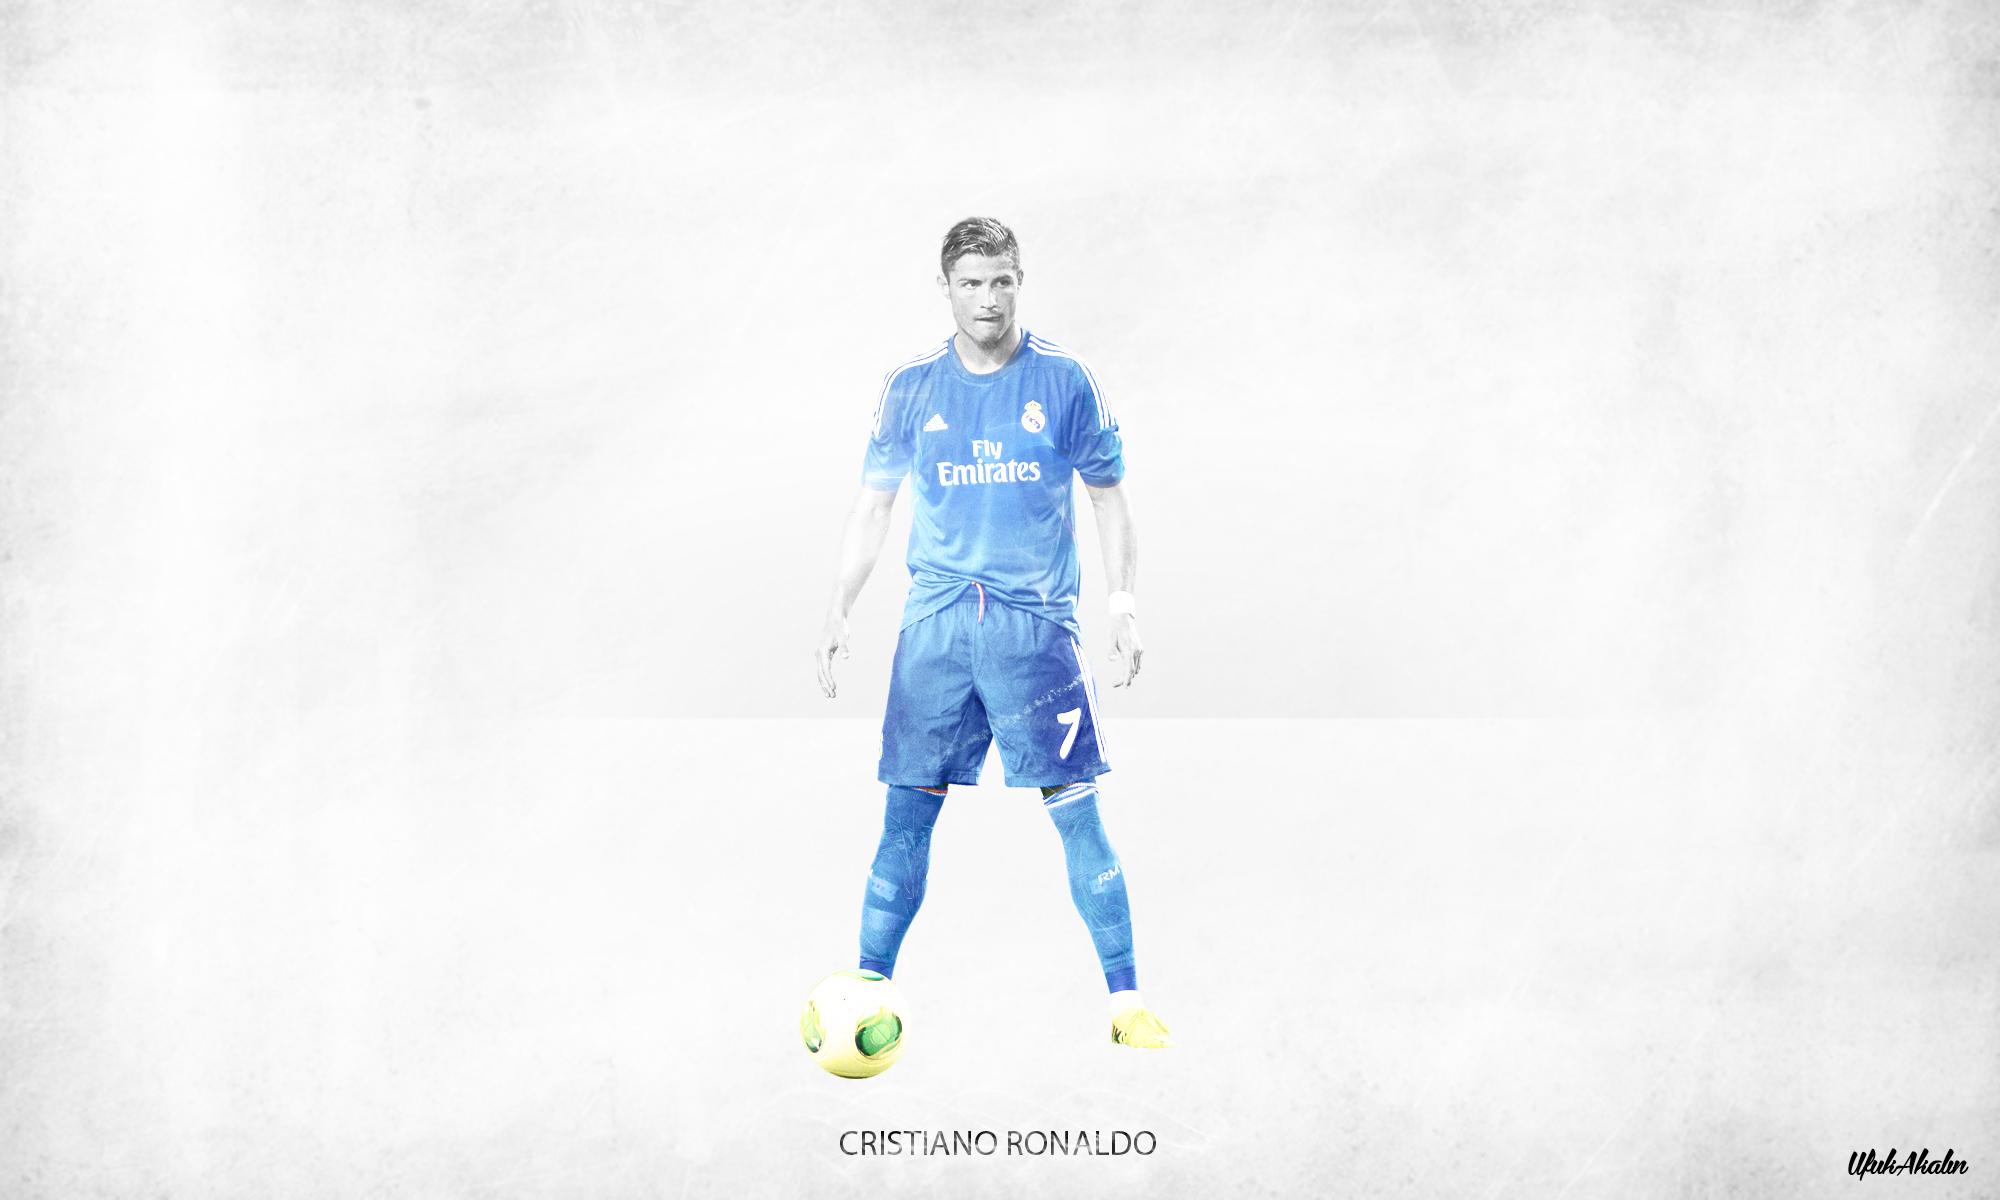 Cristiano Ronaldo Wallpaper By Ufuuk7 On Deviantart